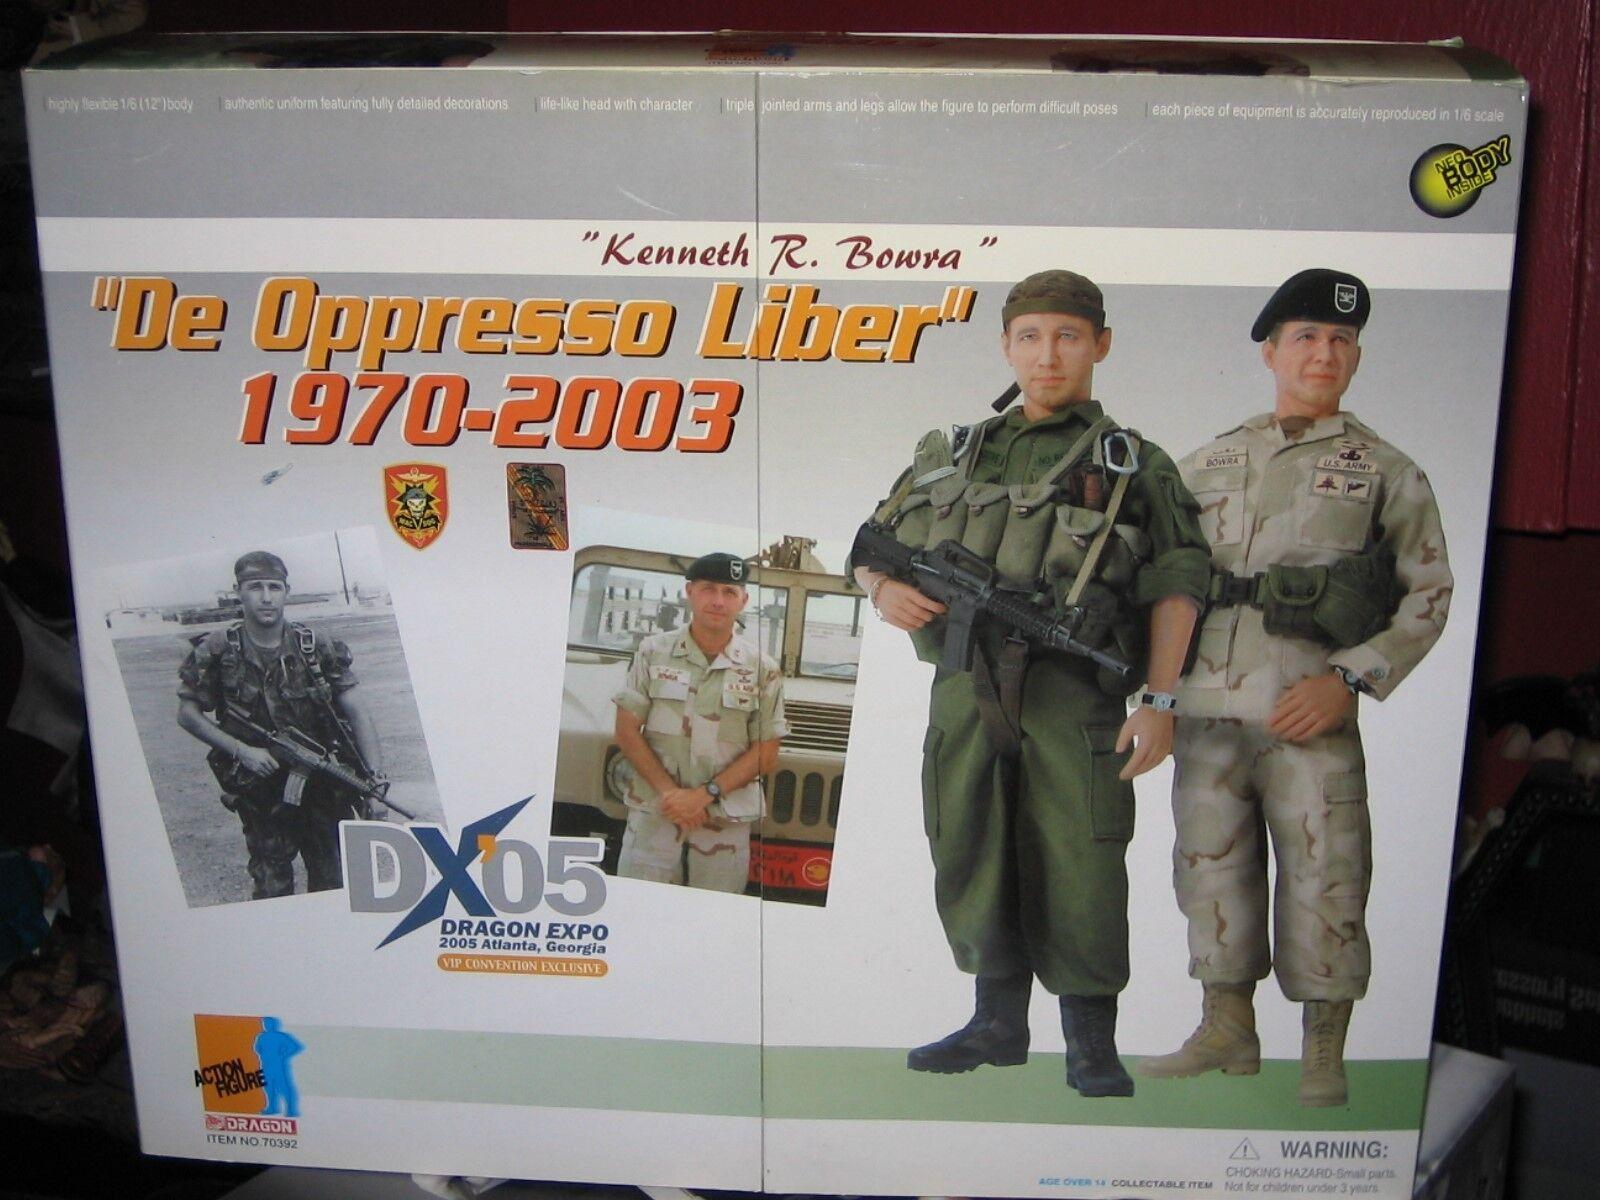 1 6 Dragon DXO5 KENNETH R BOWRA  DE OPPRESSO LIBER 1970-2003  MIB